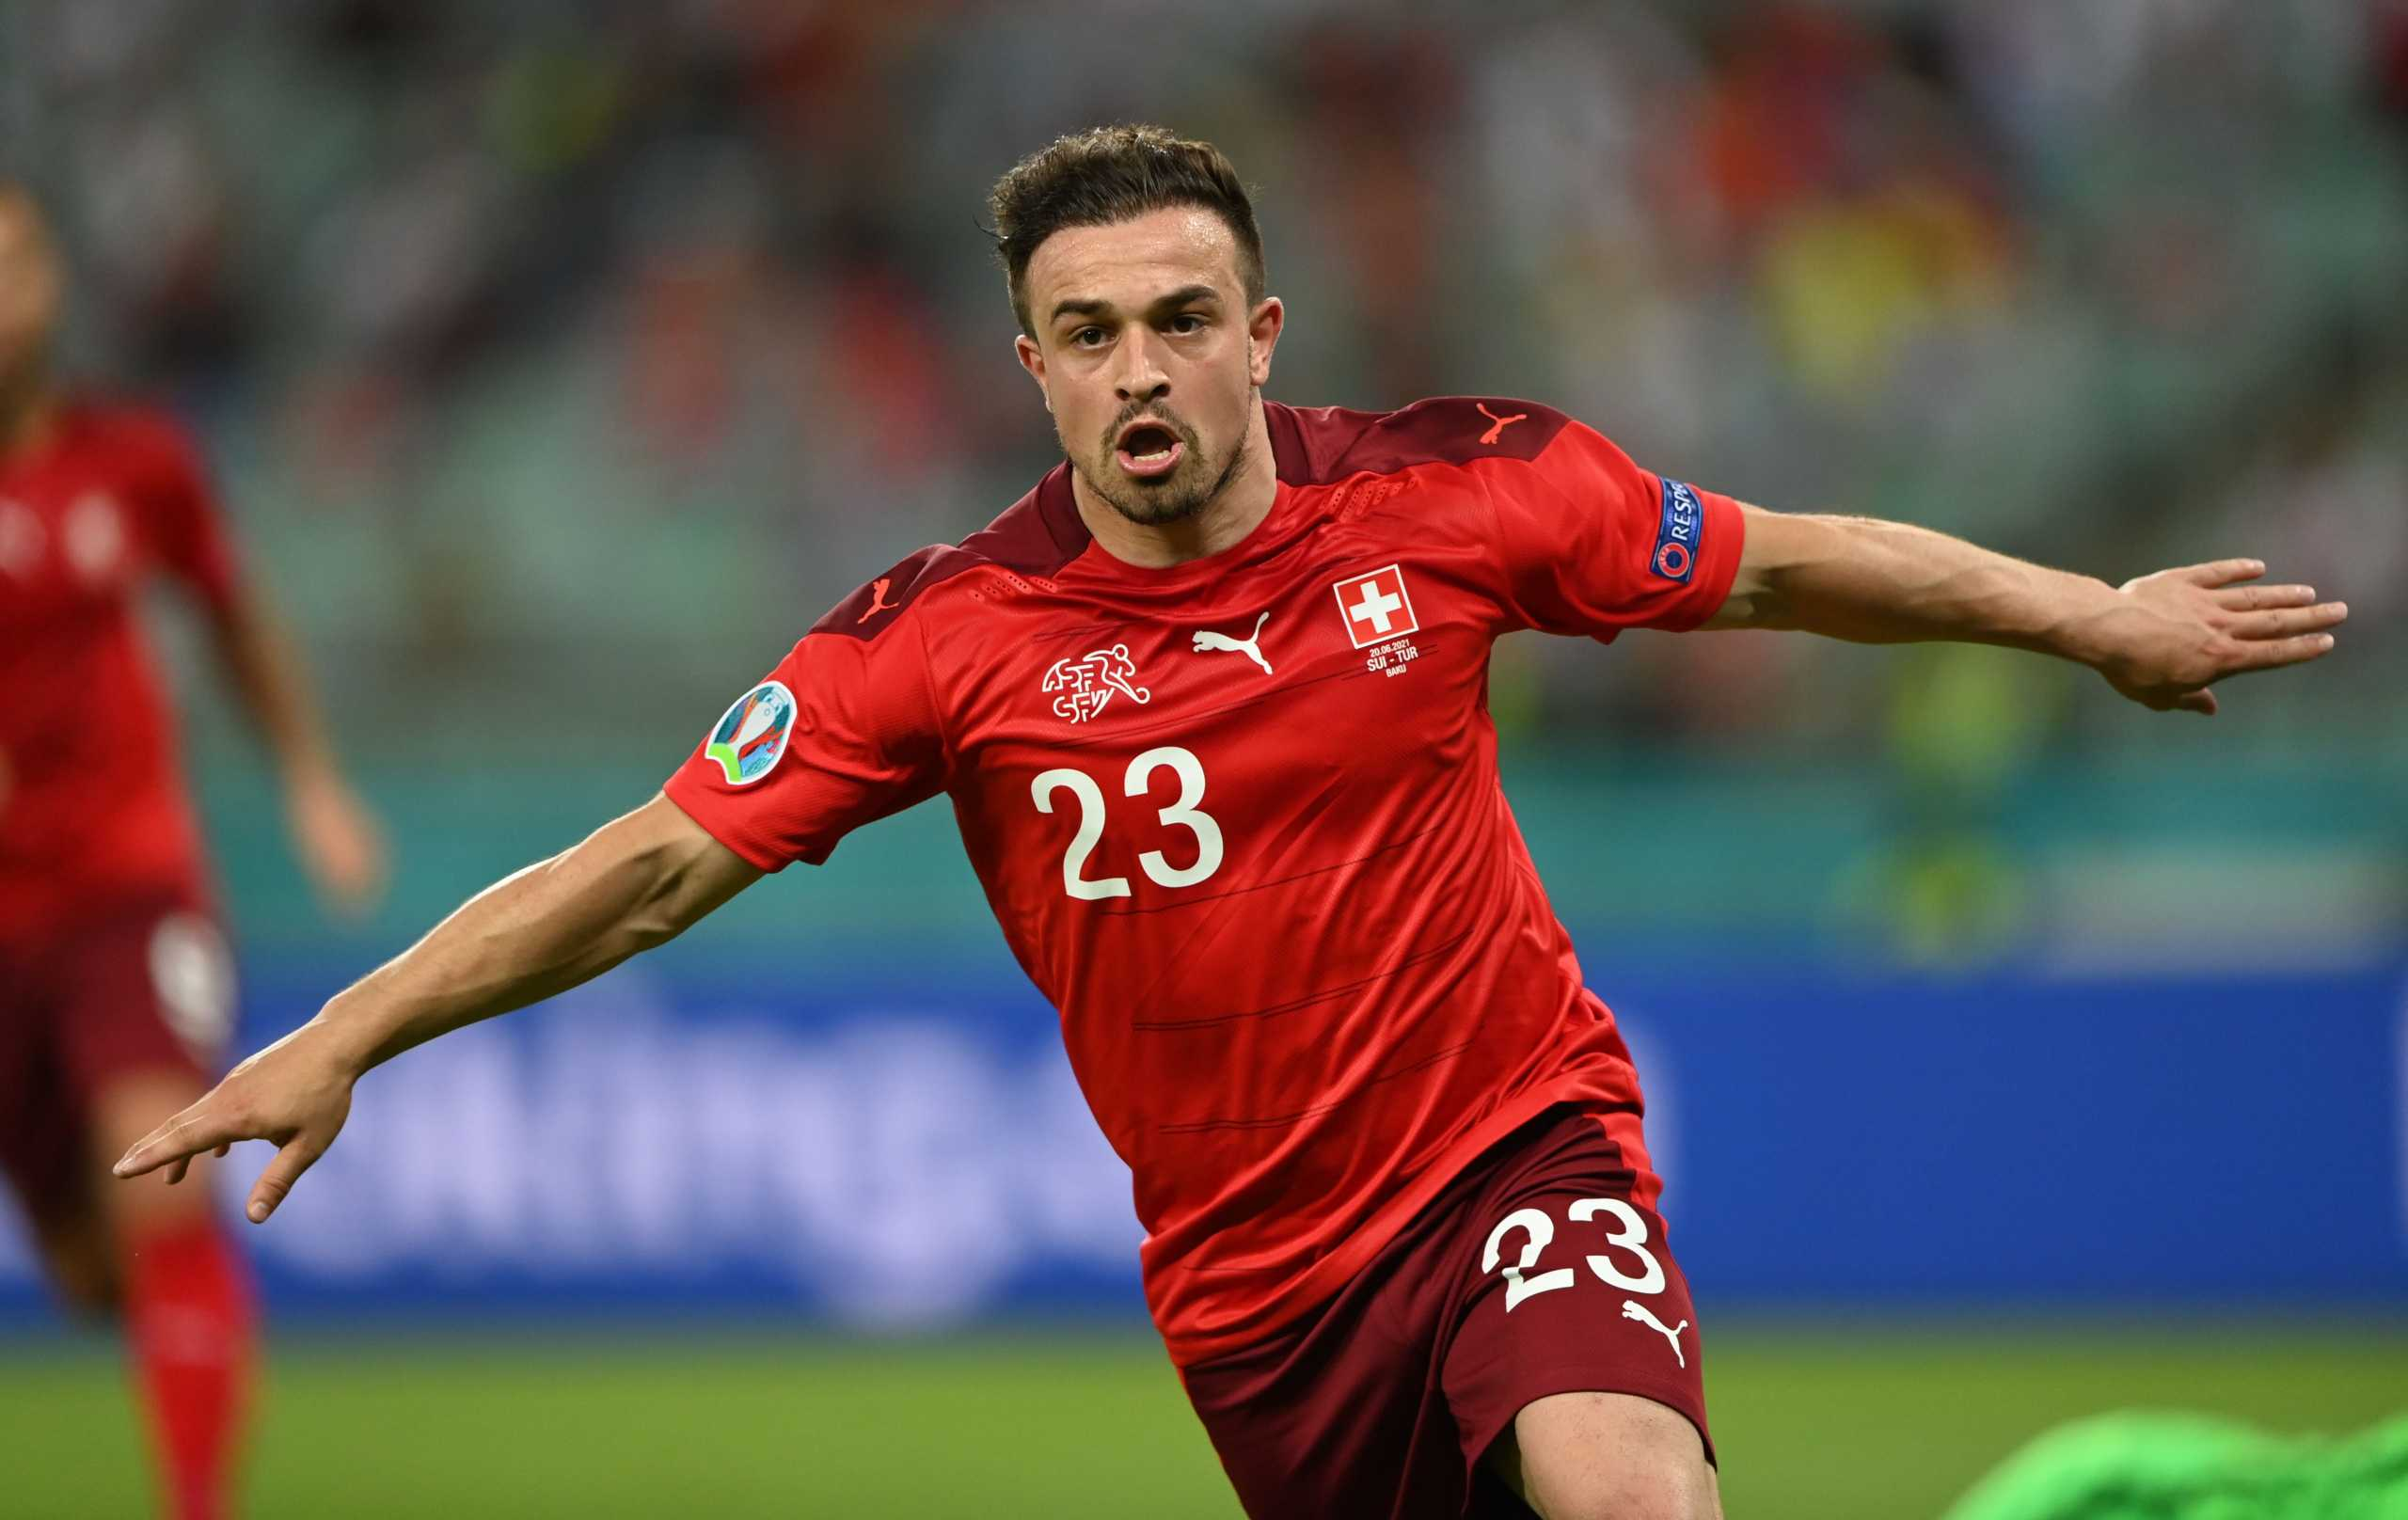 Euro 2020, Ελβετία – Τουρκία: Η γκολάρα του Καχεβτσί έδωσε ελπίδες, ο Σακίρι τις έσβησε